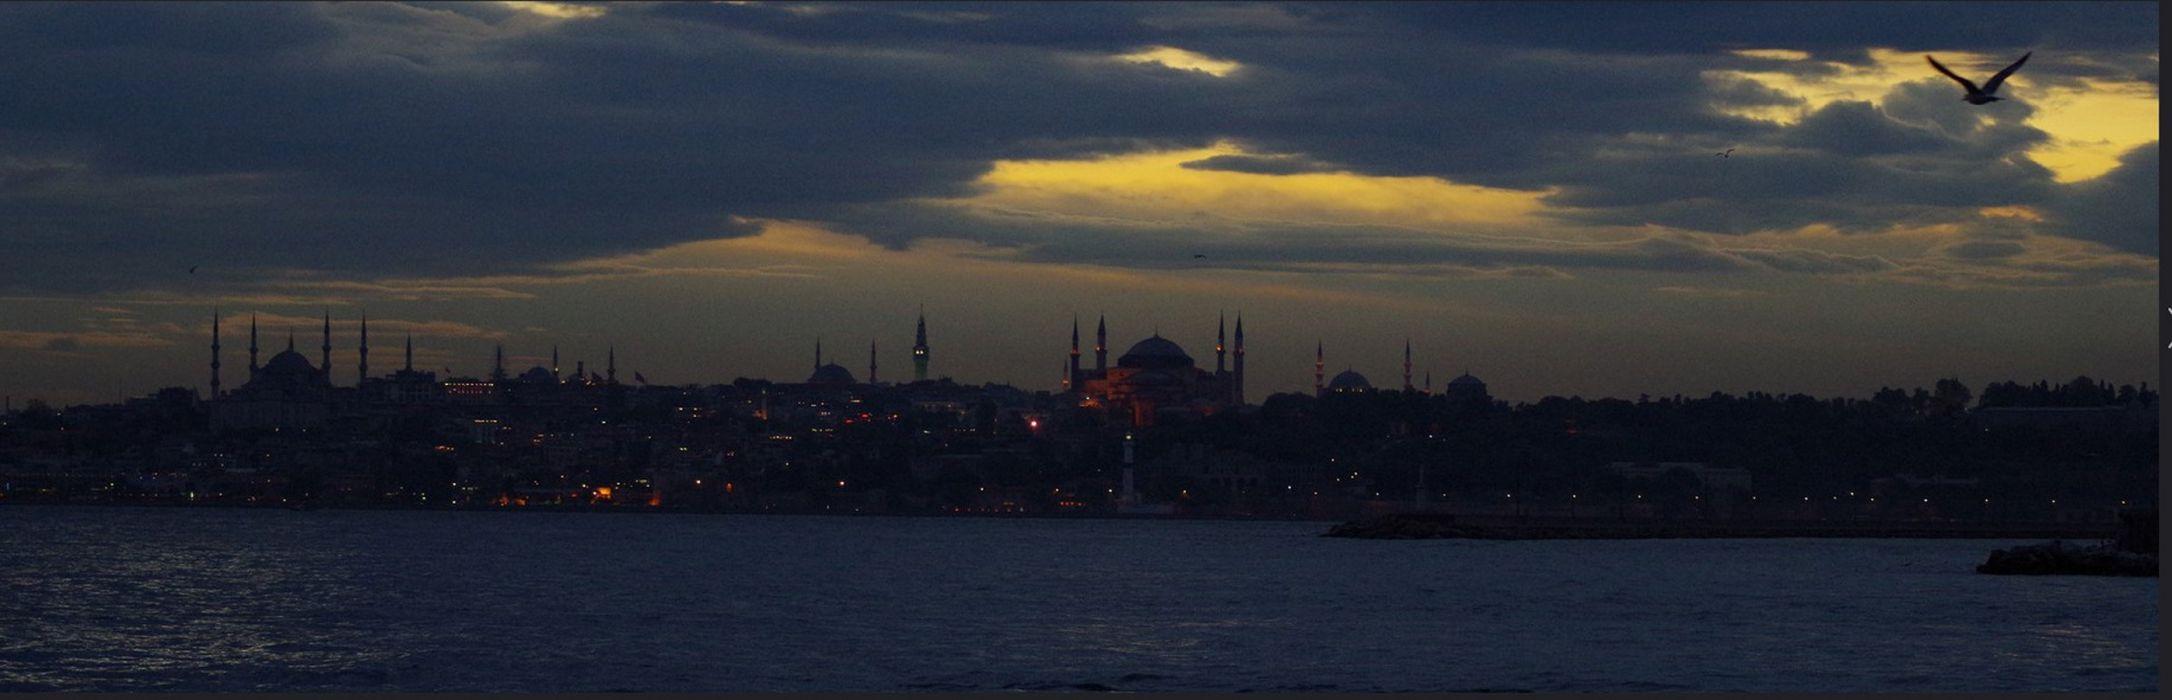 original turkey istanbul photo beauty city sky bird clouds night light wallpaper